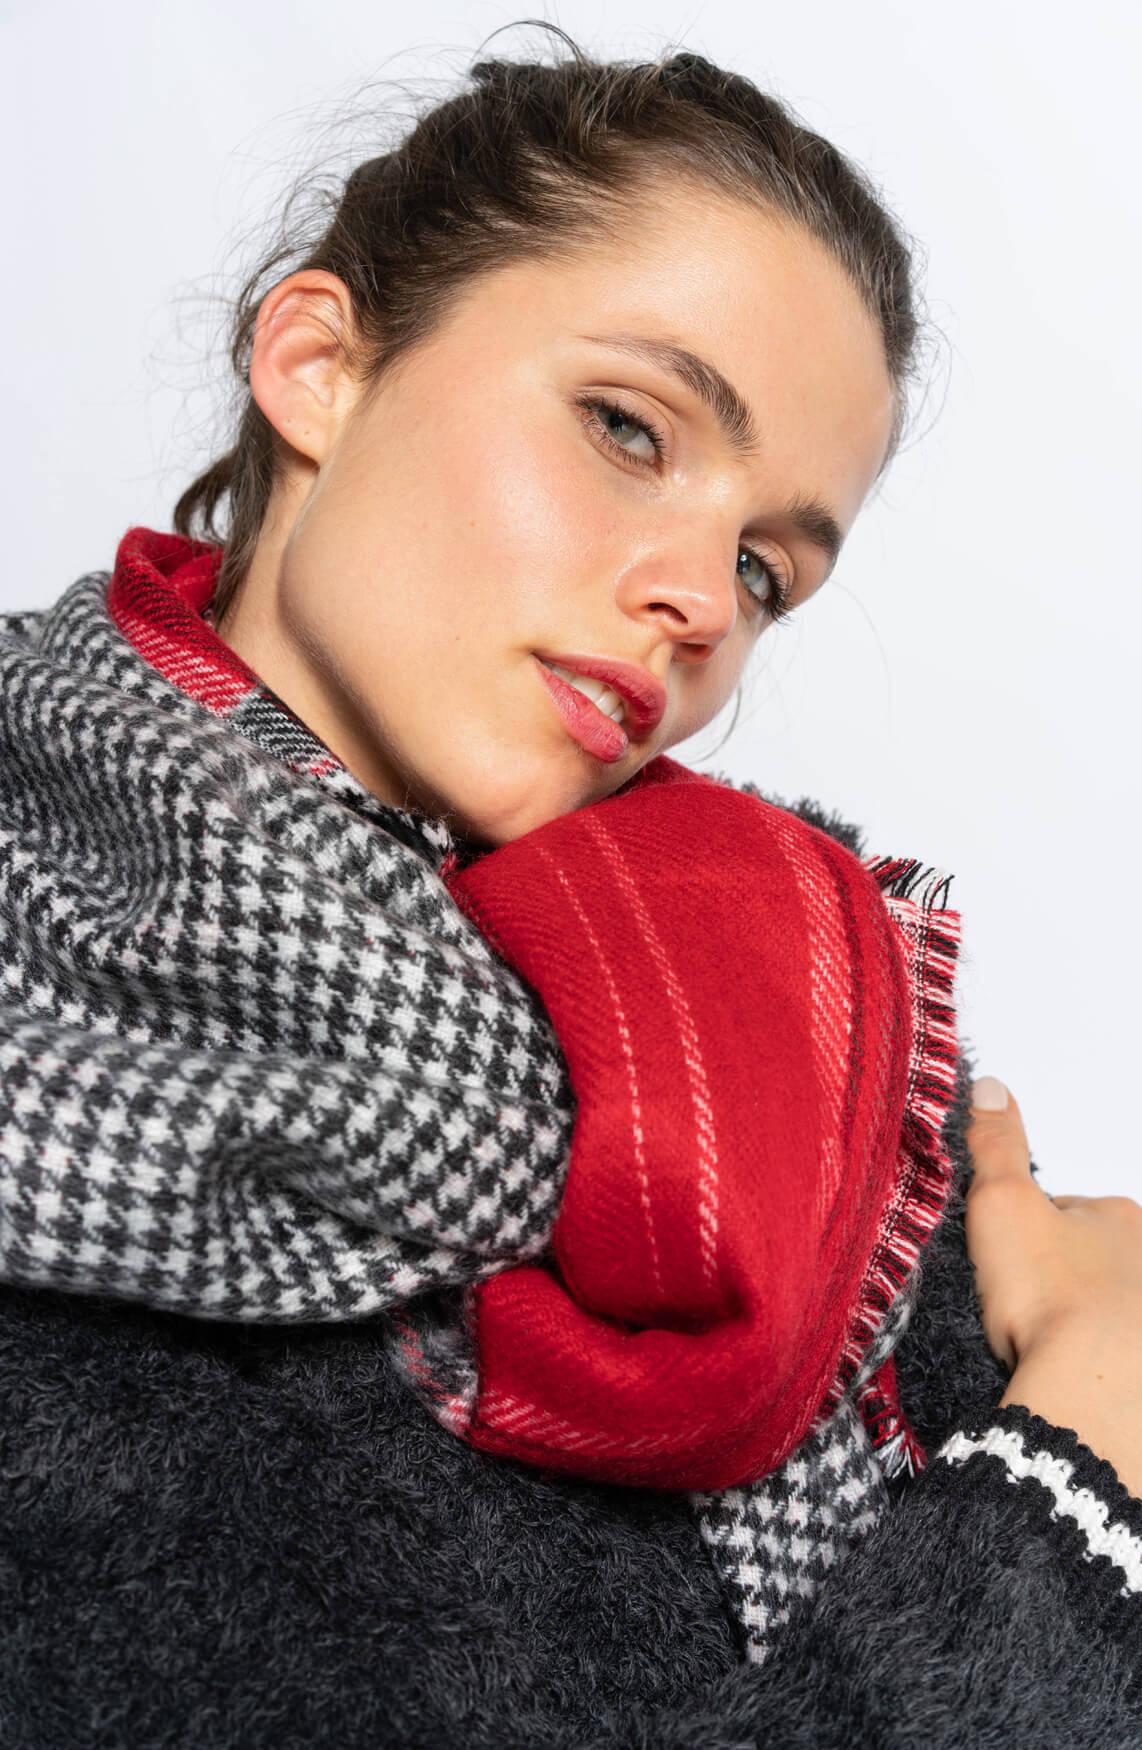 Anna Blue Dames Pied-de-coque shawl Rood